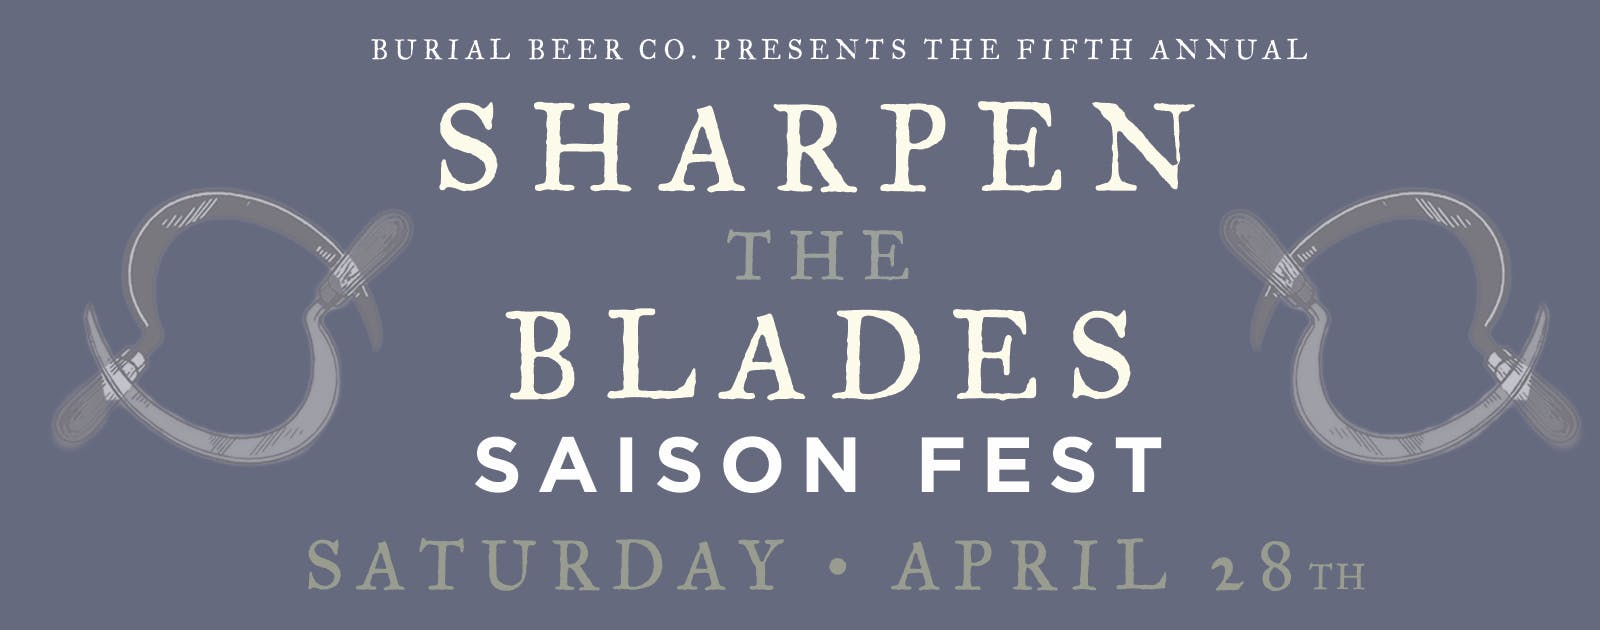 Sharpen the Blades Saison Fest 2018